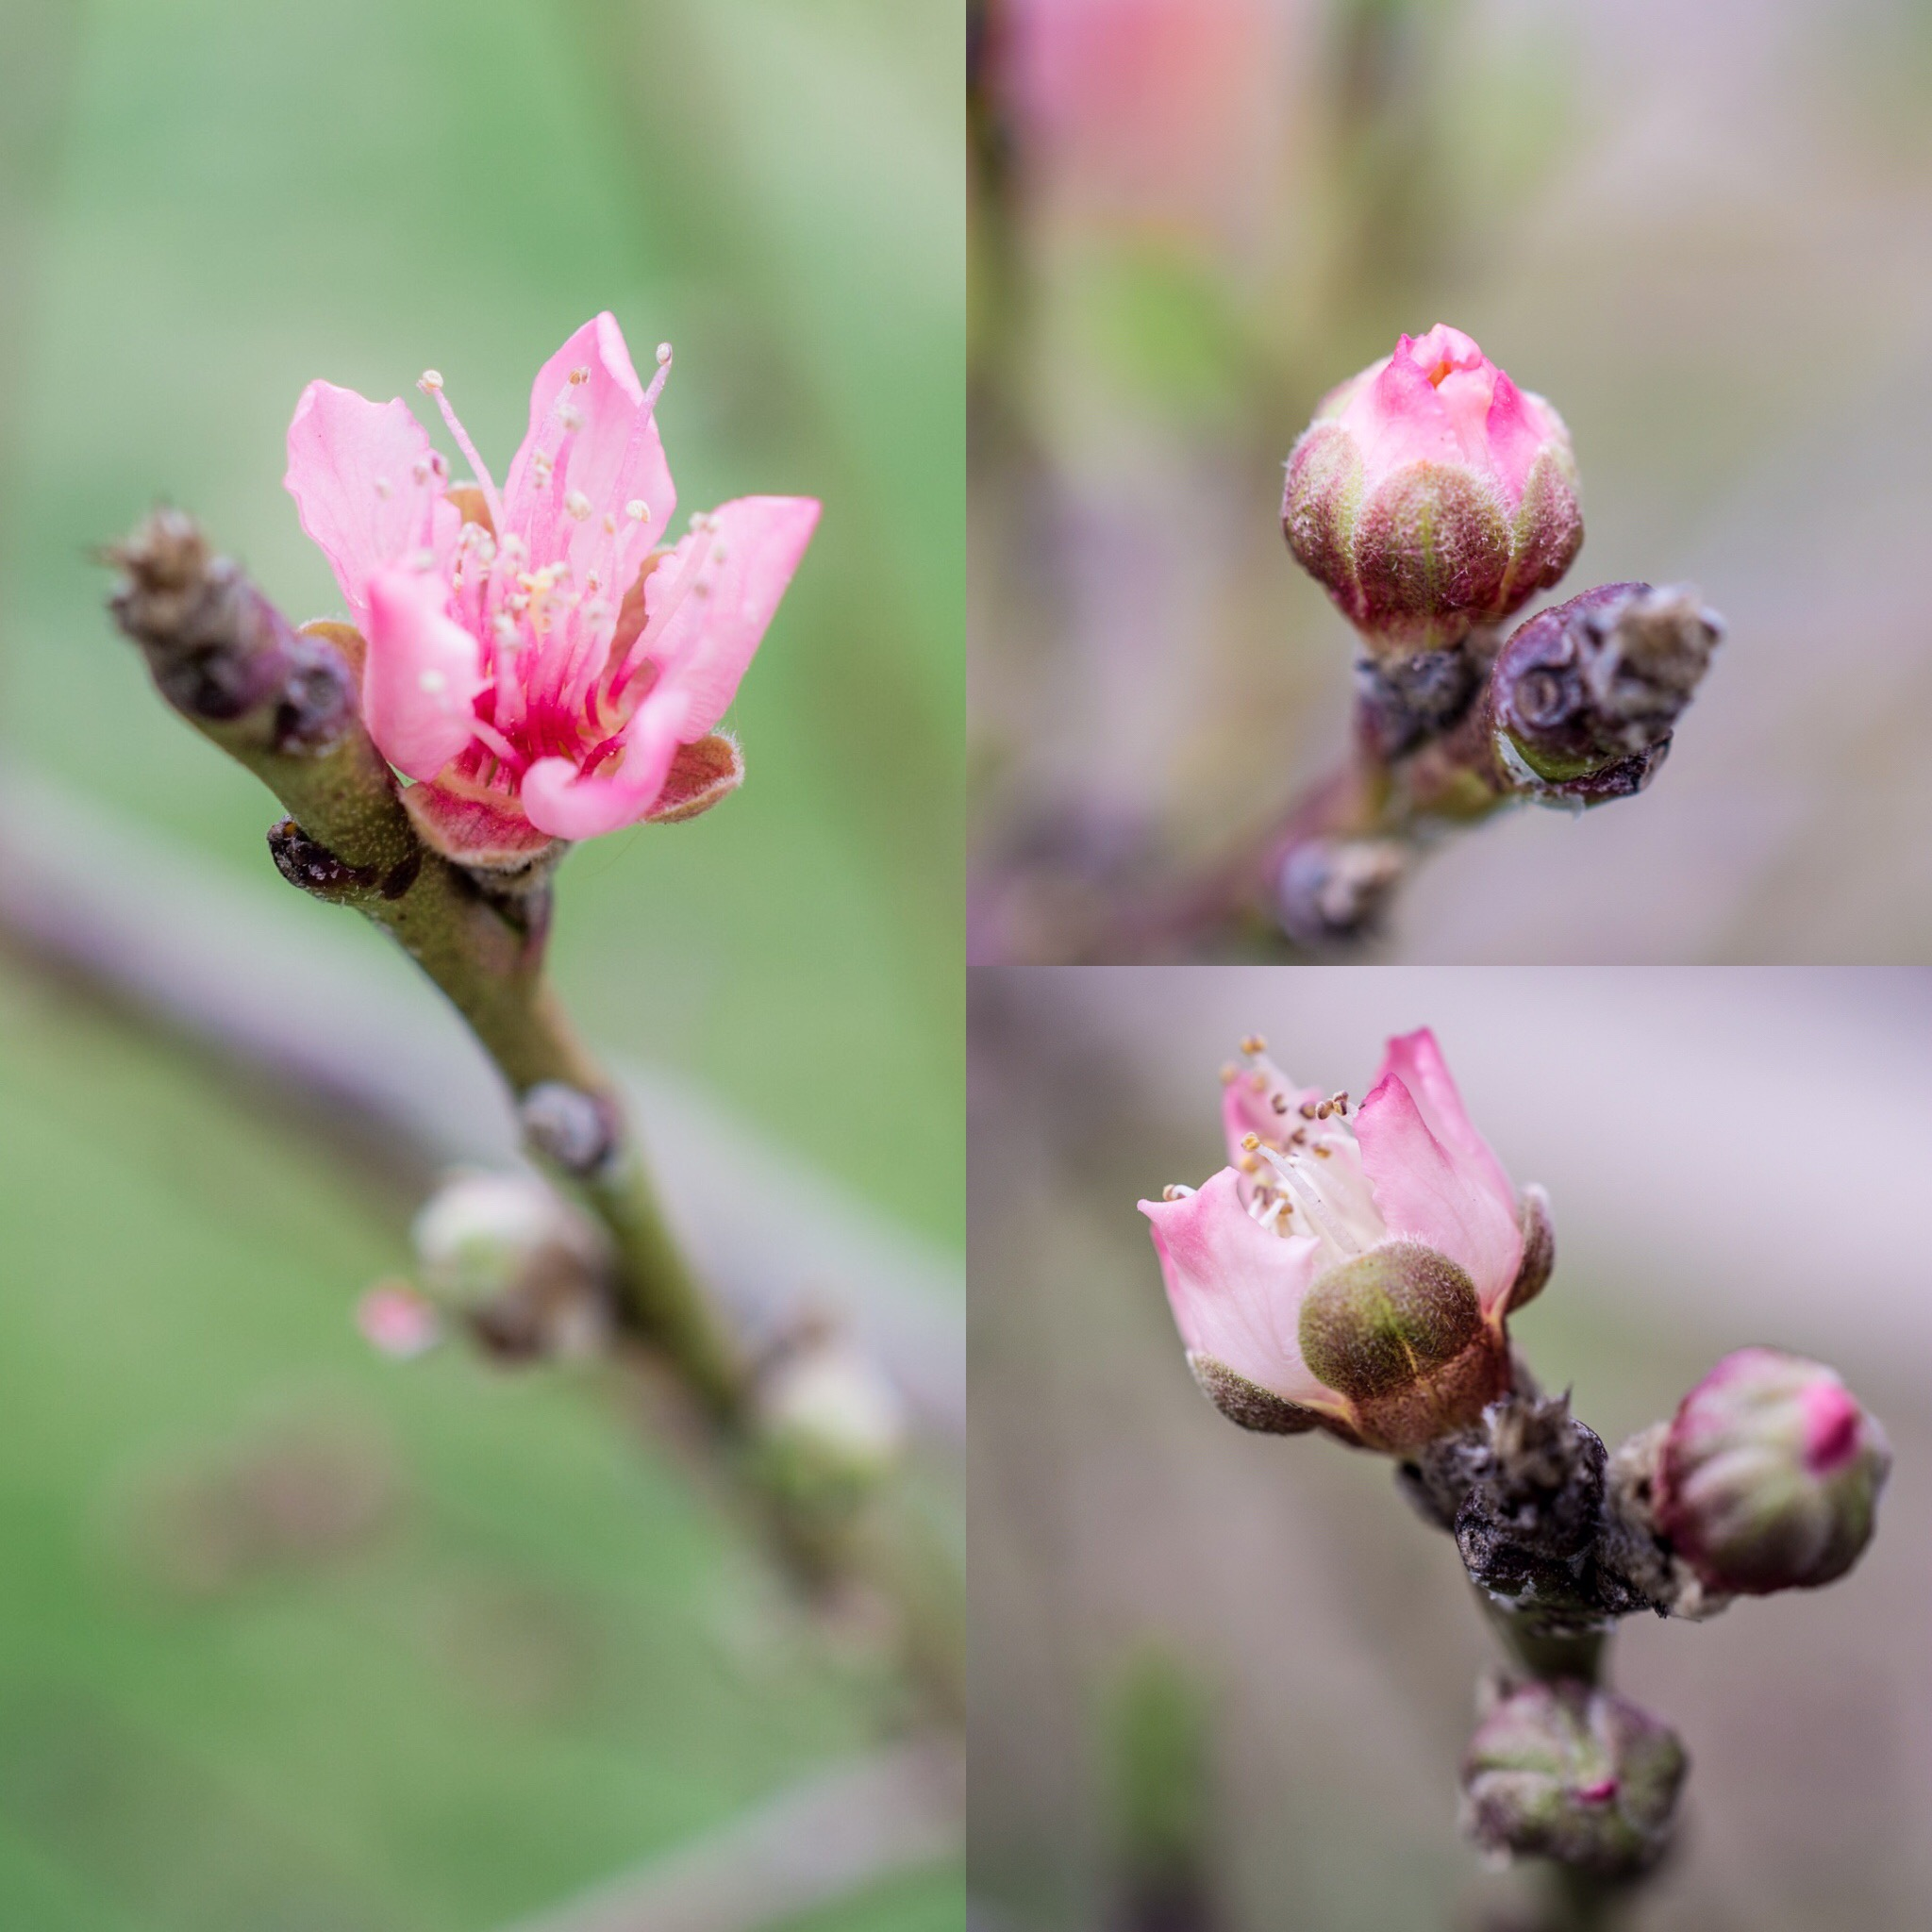 ren zatopek spiritwork essays poetry visions folk magic lesson peaches pregnancy and poetry